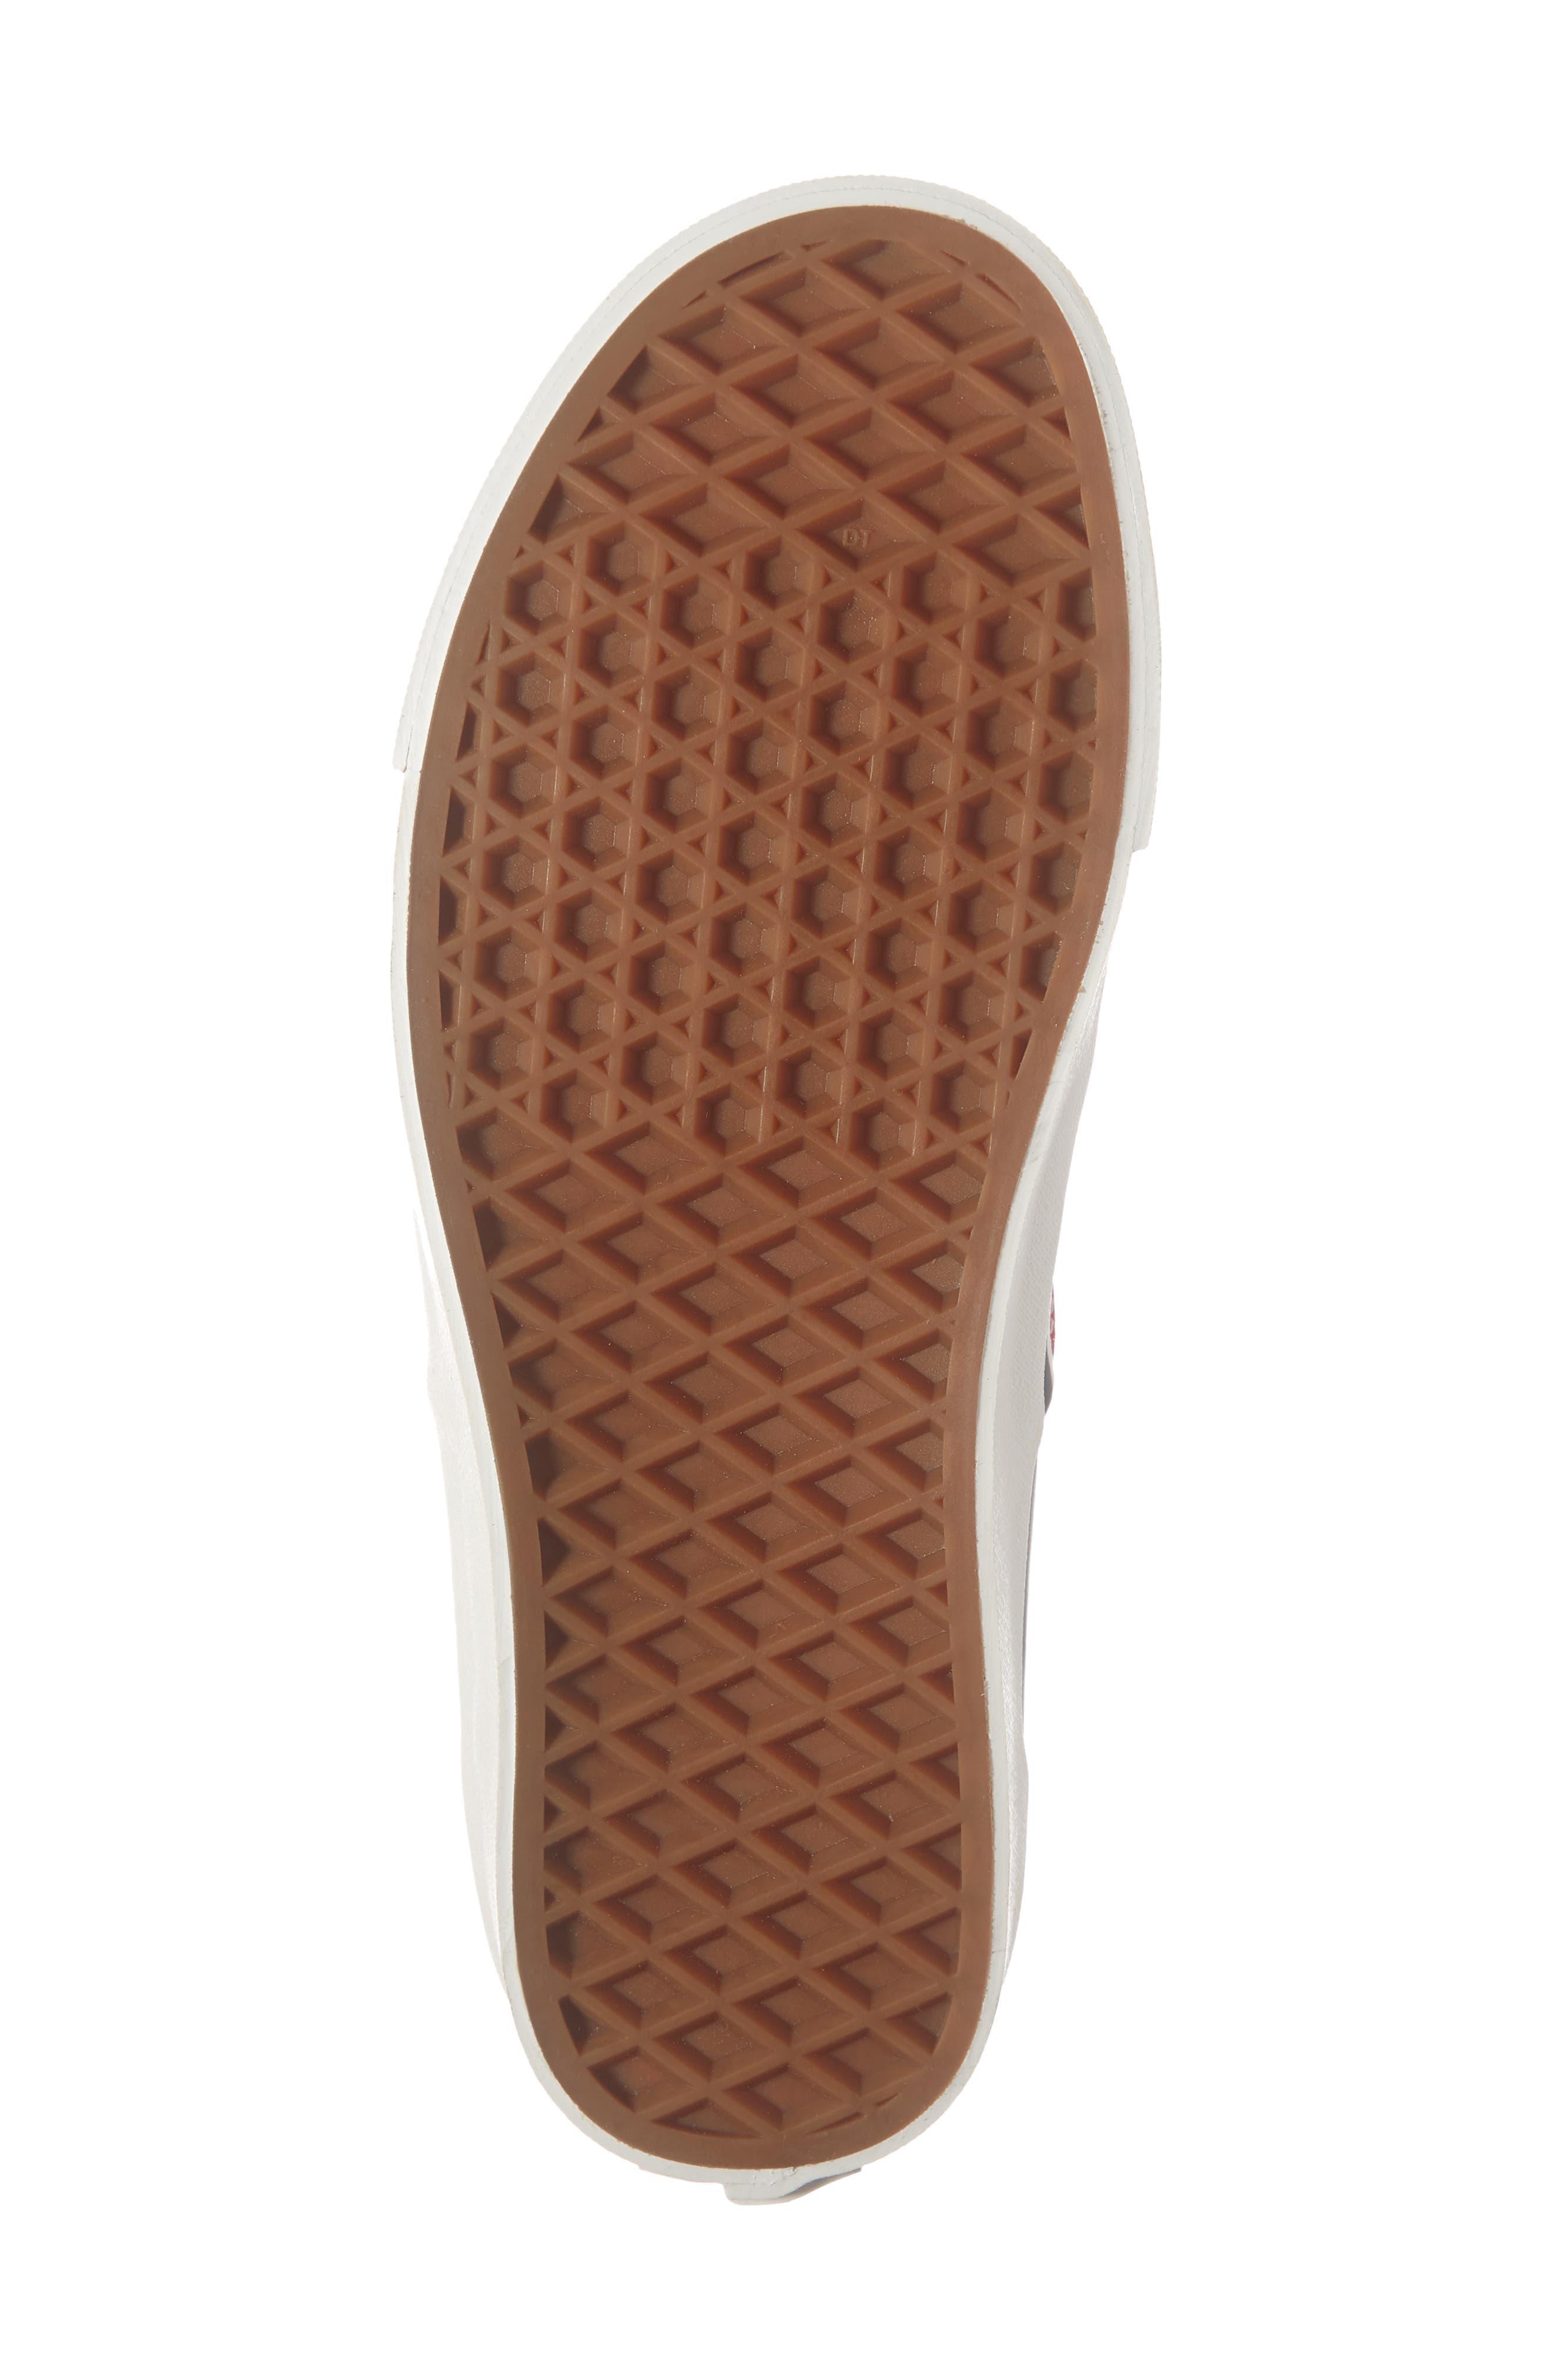 VANS, Authentic 44 DX Sneaker, Alternate thumbnail 6, color, RED/ CHECK